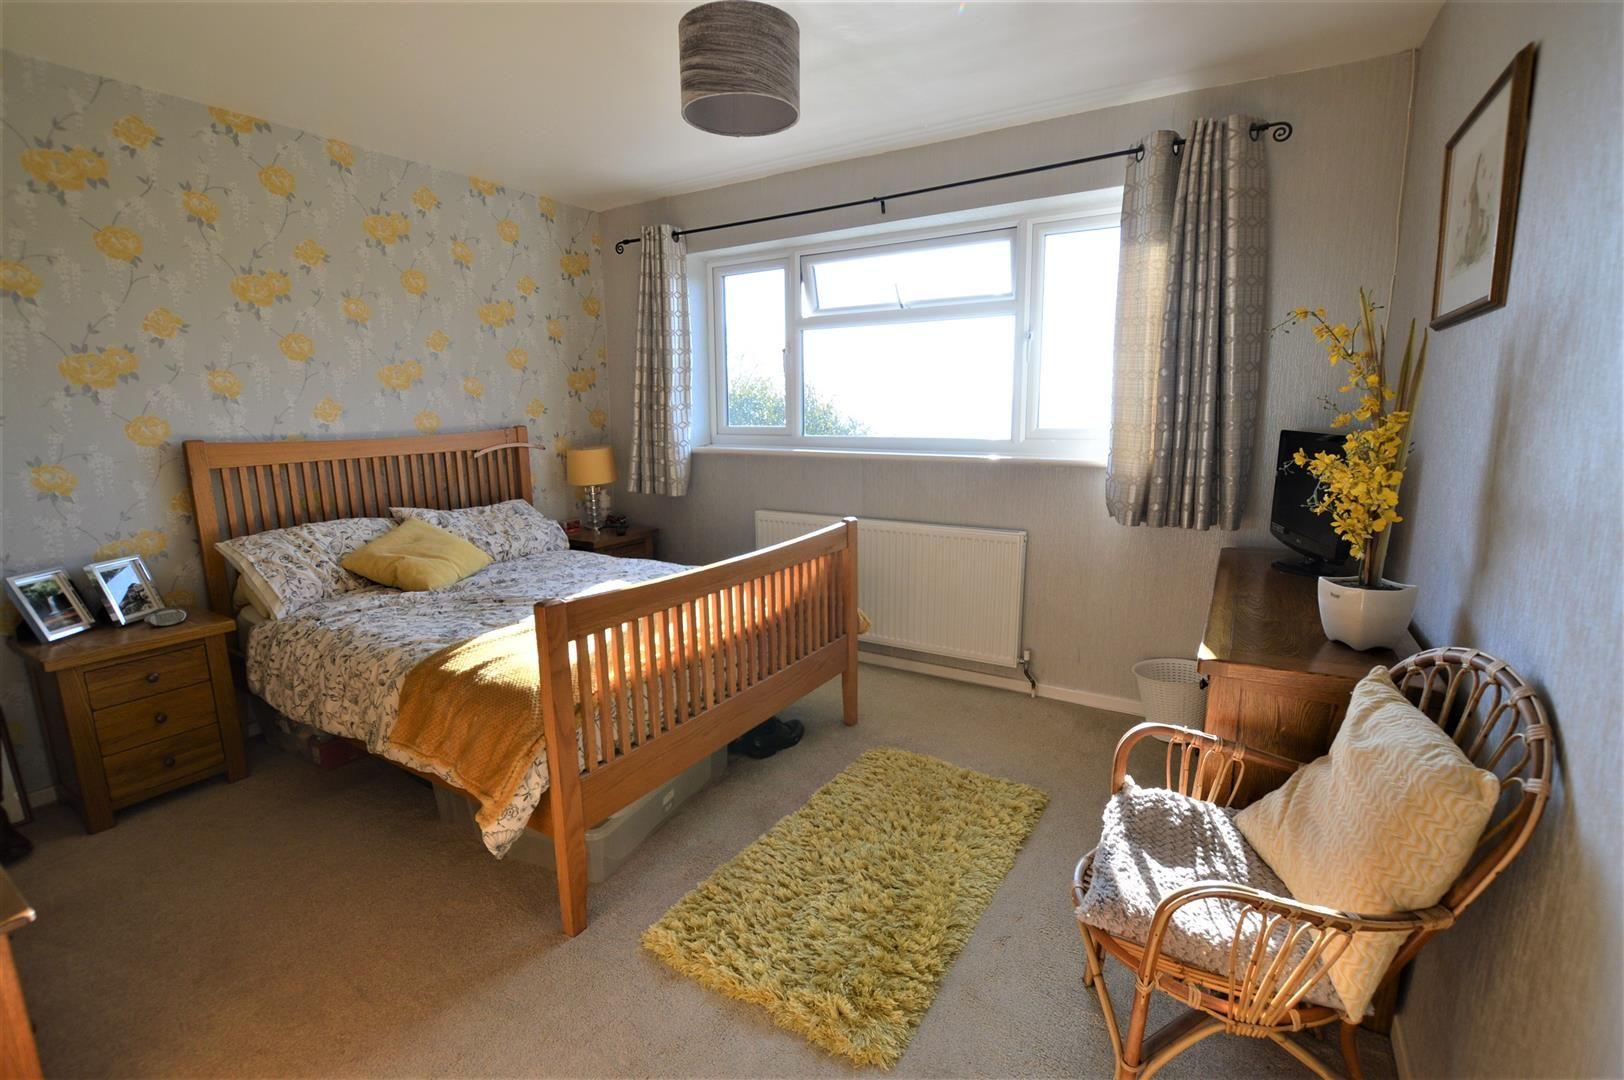 4 bed semi-detached for sale in Bromyard  - Property Image 6